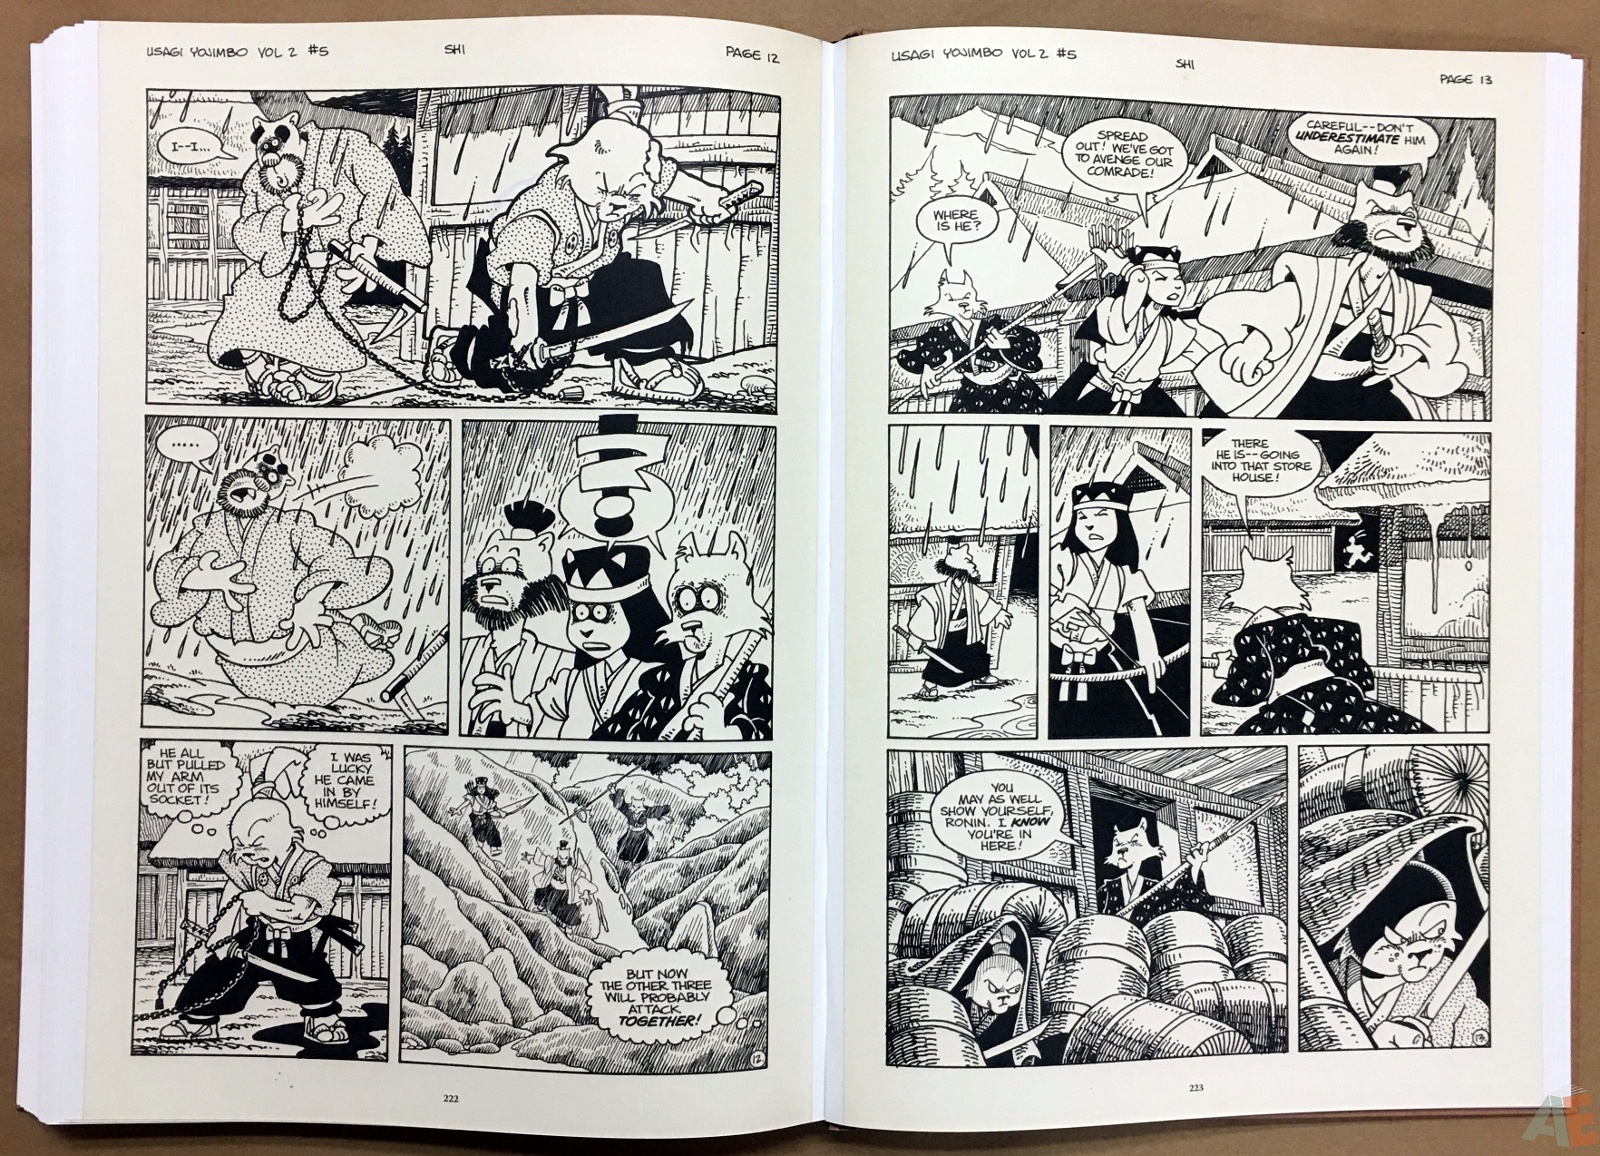 Usagi Yojimbo: Samurai and Other Stories Gallery Edition 38